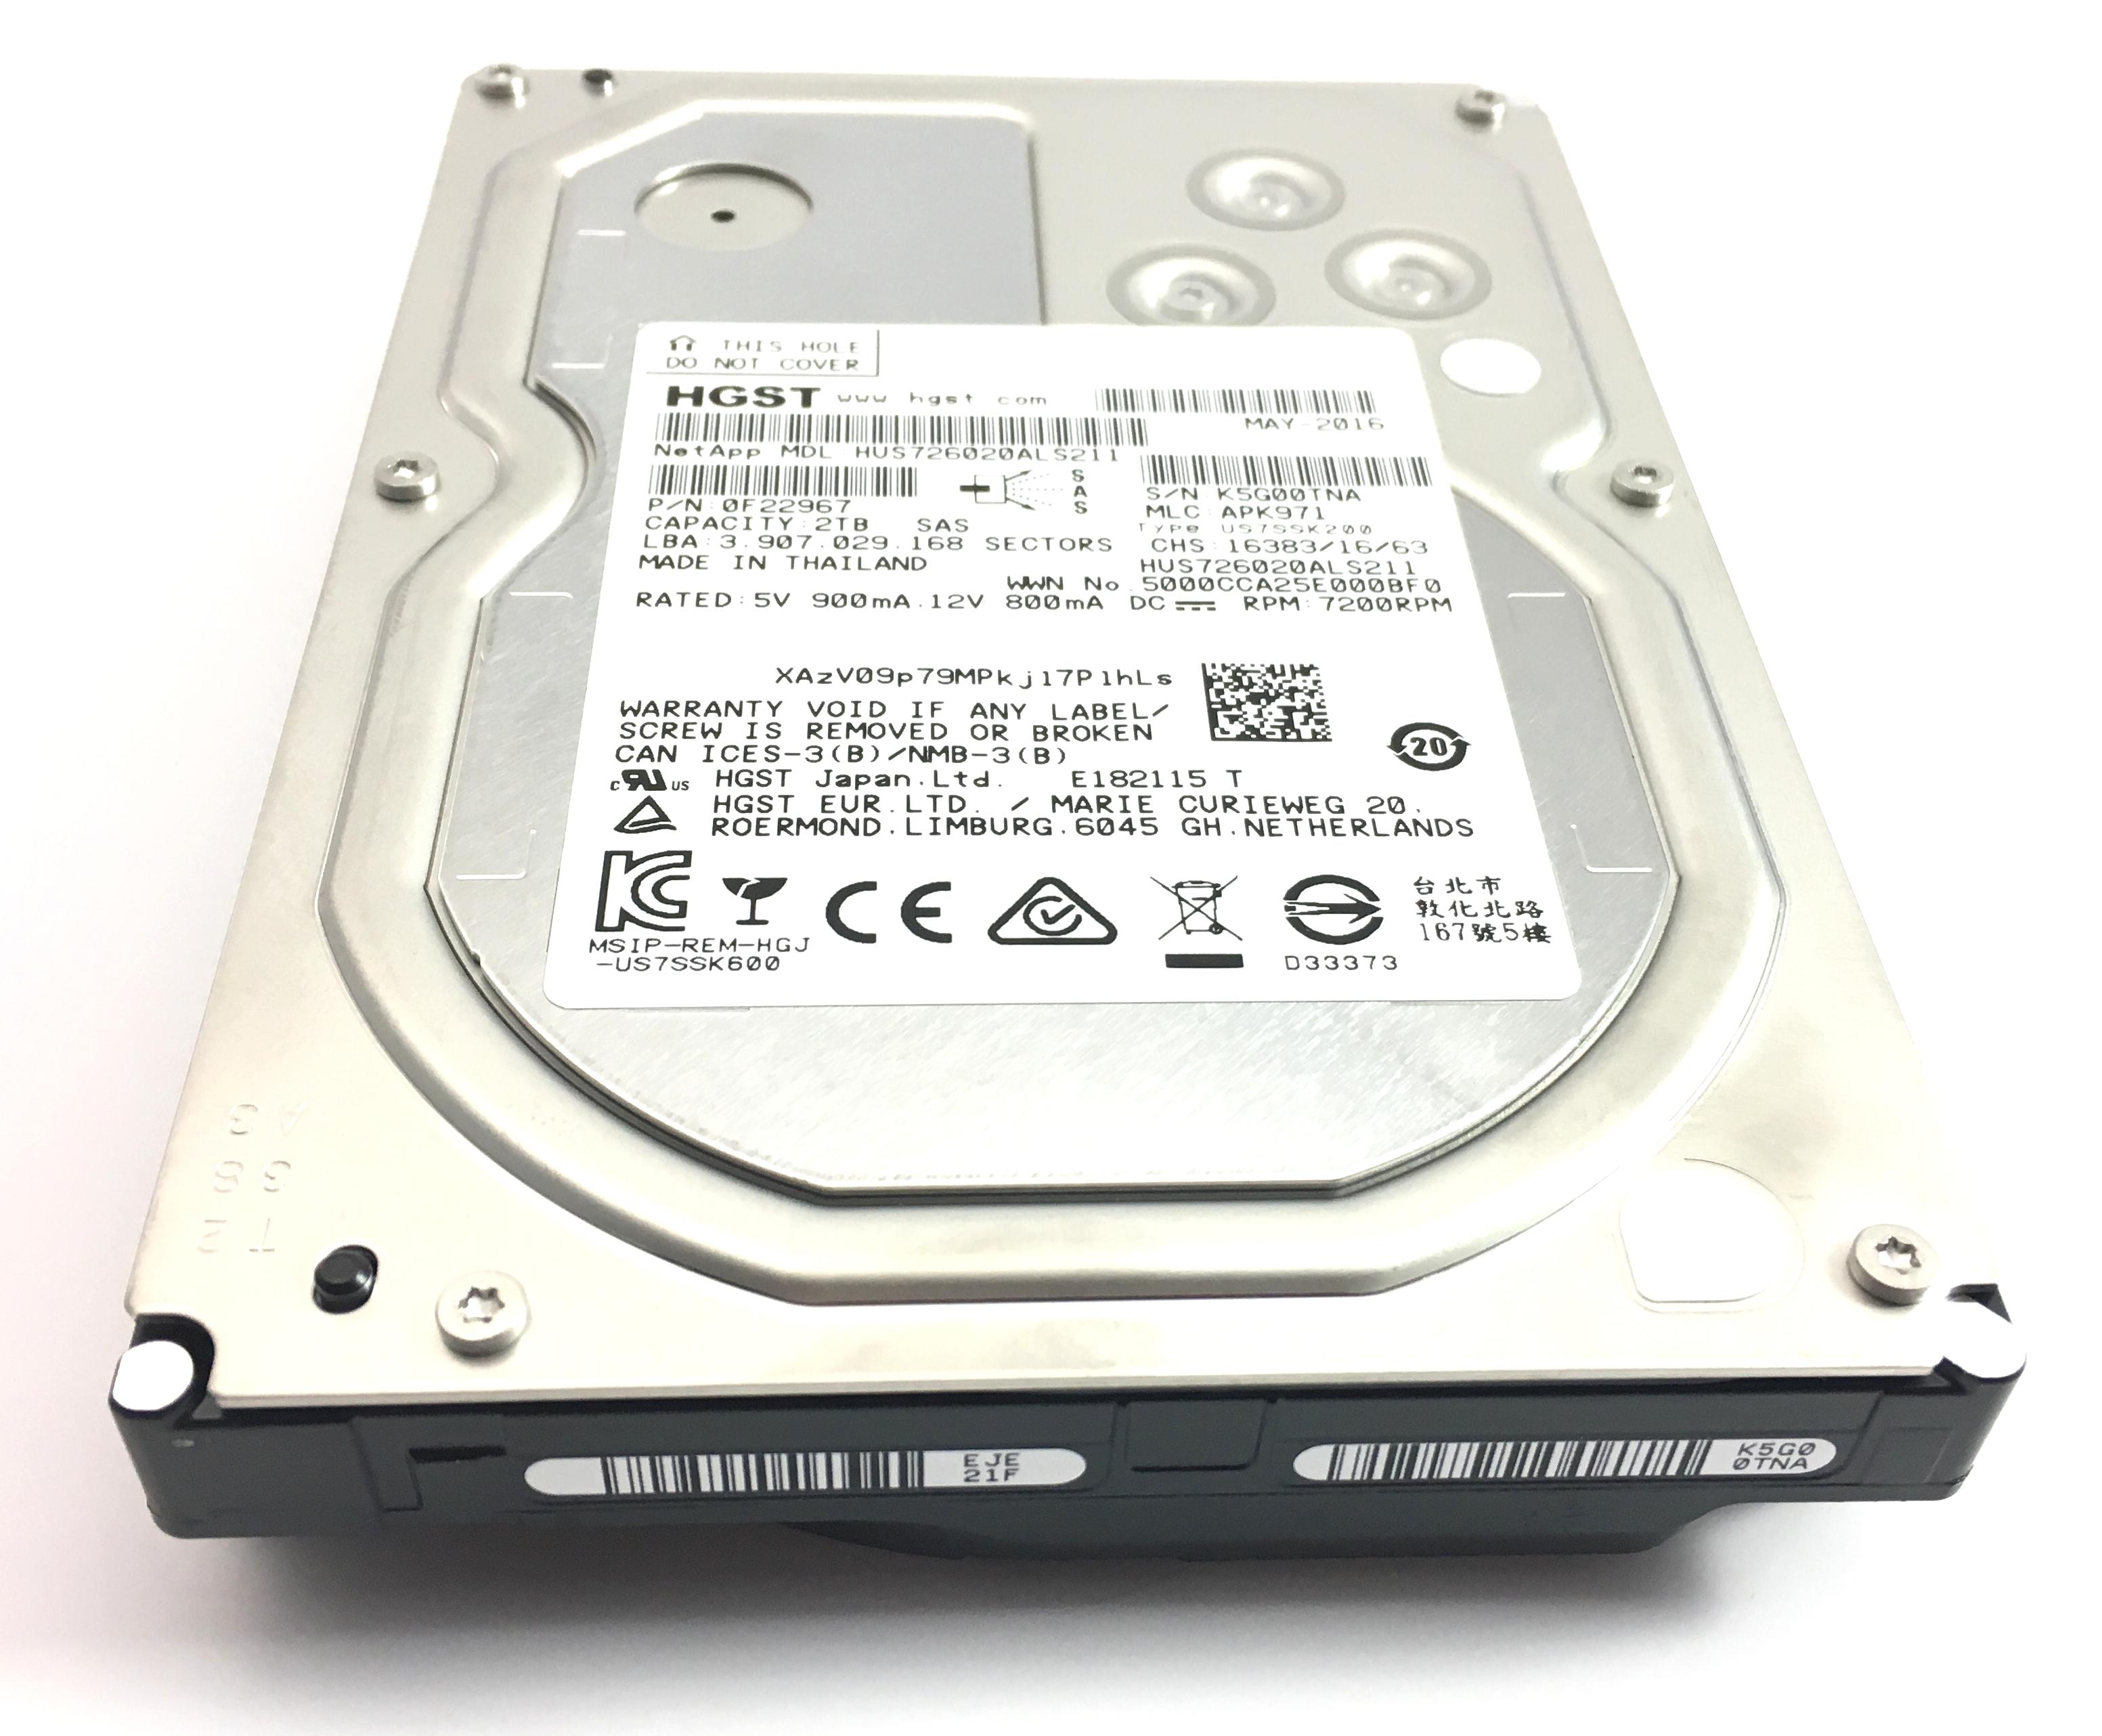 HGST ULTRASTAR NETAPP 2TB 7.2K SAS 3.5'' HARD DRIVE (HUS726020ALS211)